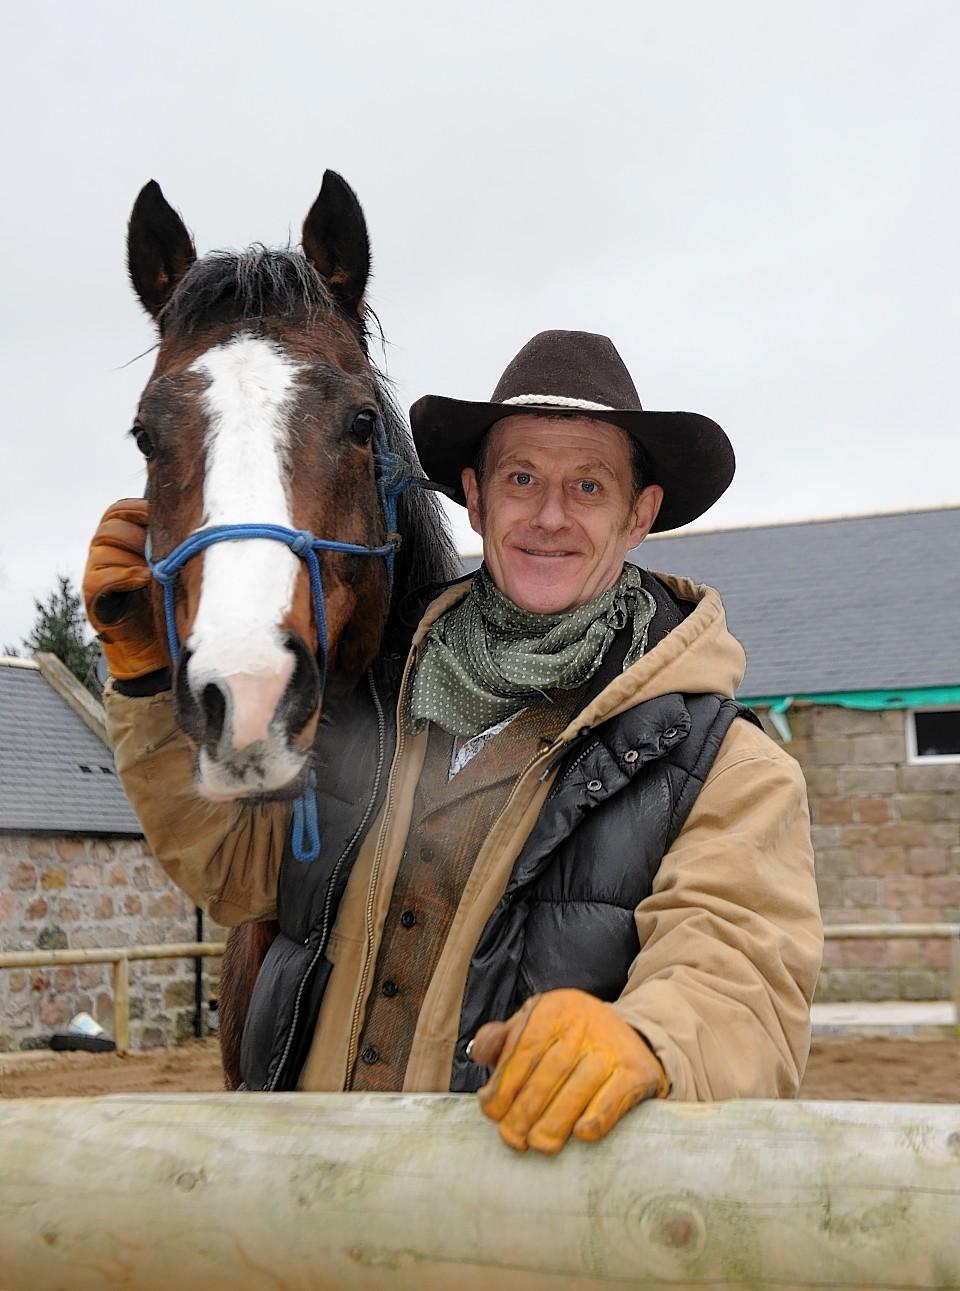 Jock Hutchison at Horseback UK